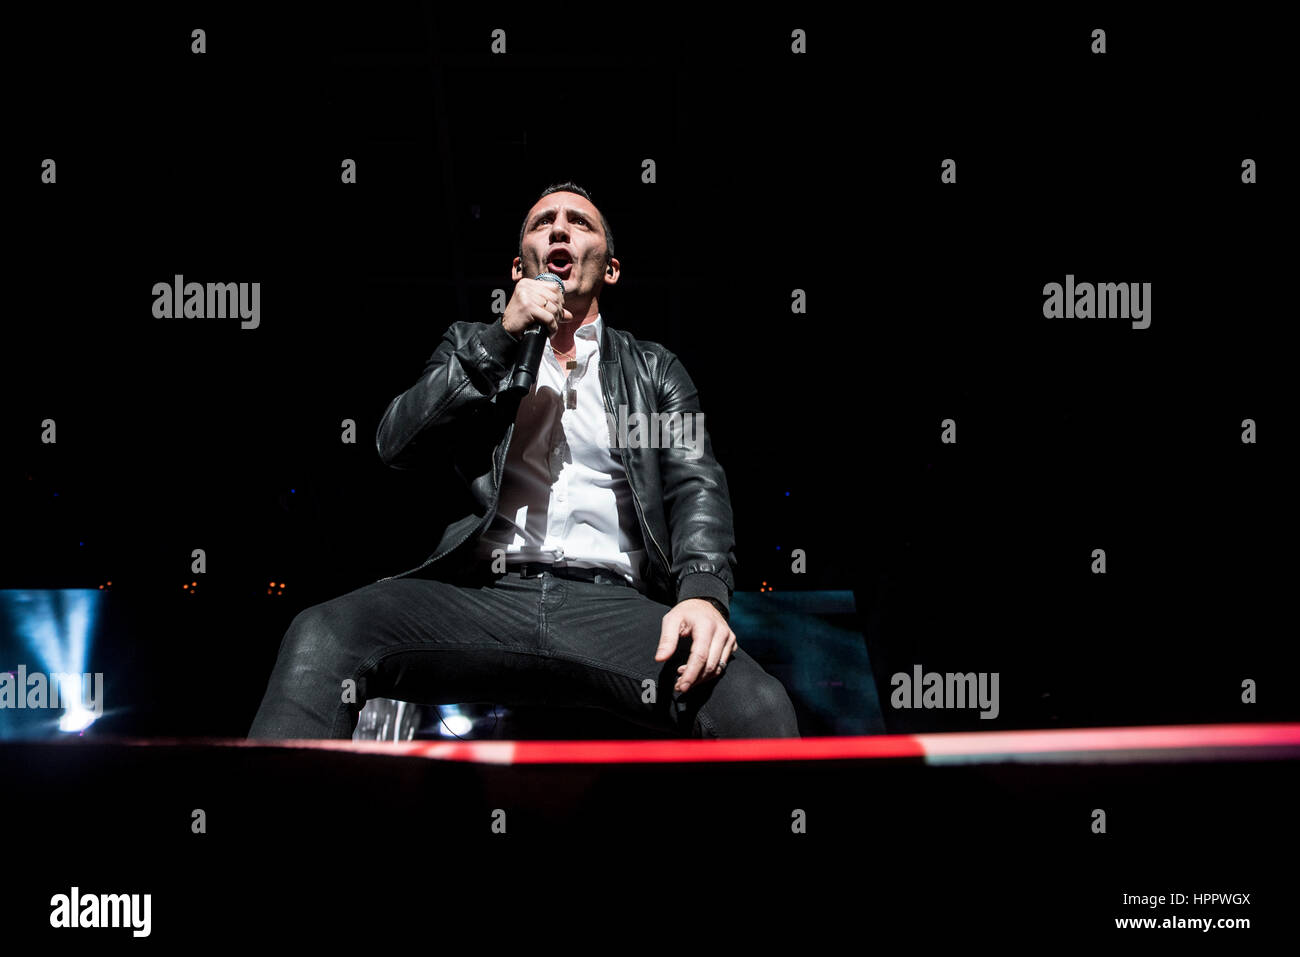 Moda del cantante Silvestre Kekko realizar en Torino en el Pala Alpitour durante la Passione Maledetta Tour Imagen De Stock